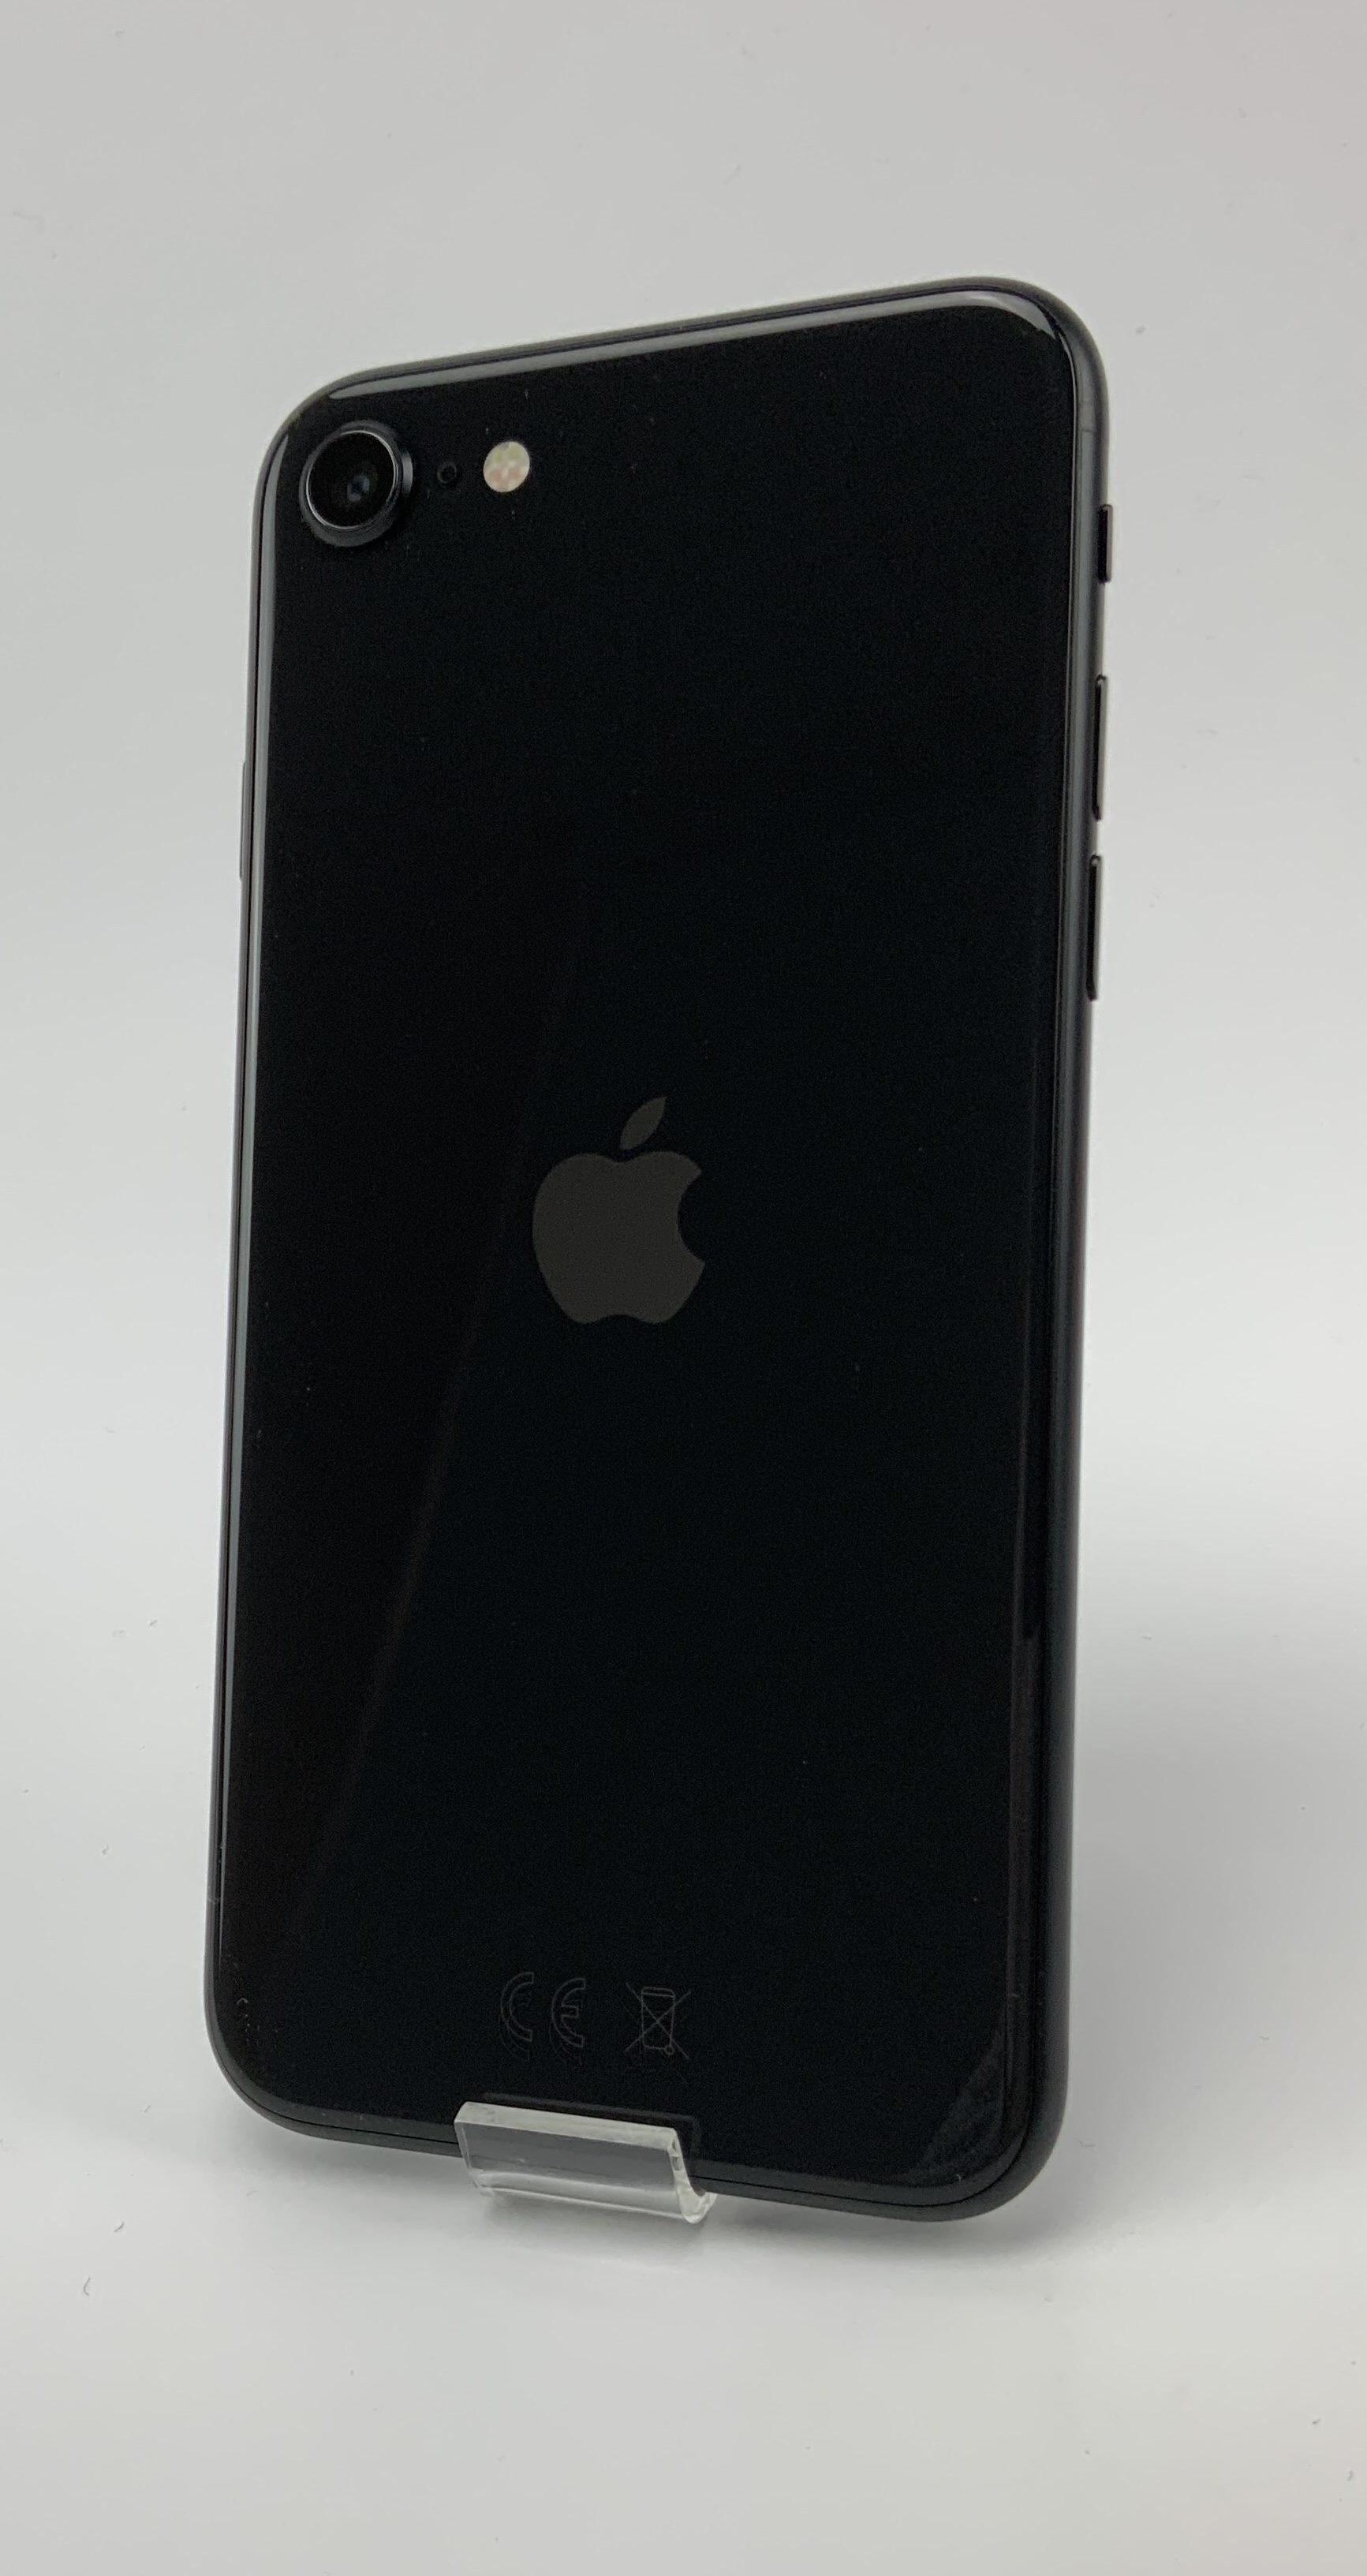 iPhone SE (2nd Gen) 64GB, 64GB, Black, imagen 2